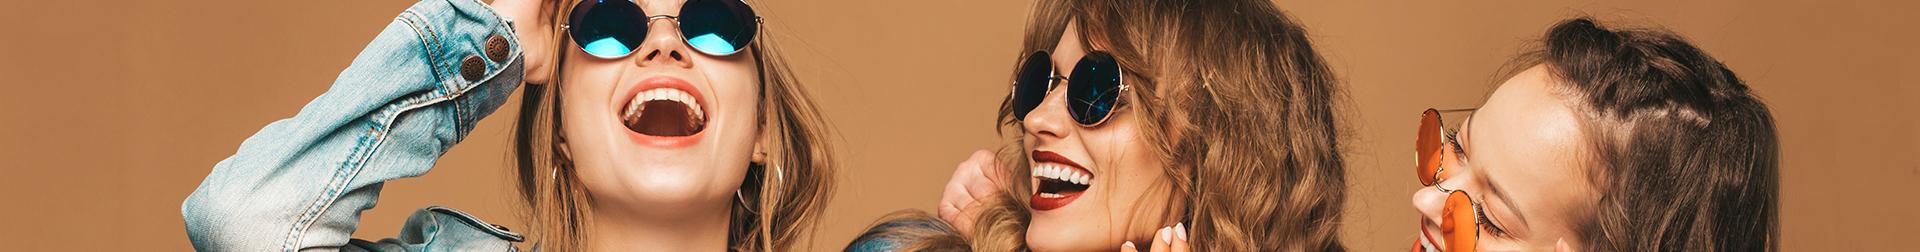 Sunglasses | Sunglasses - Buy Stylish Sunglasses and Shades Online | AromaCraze